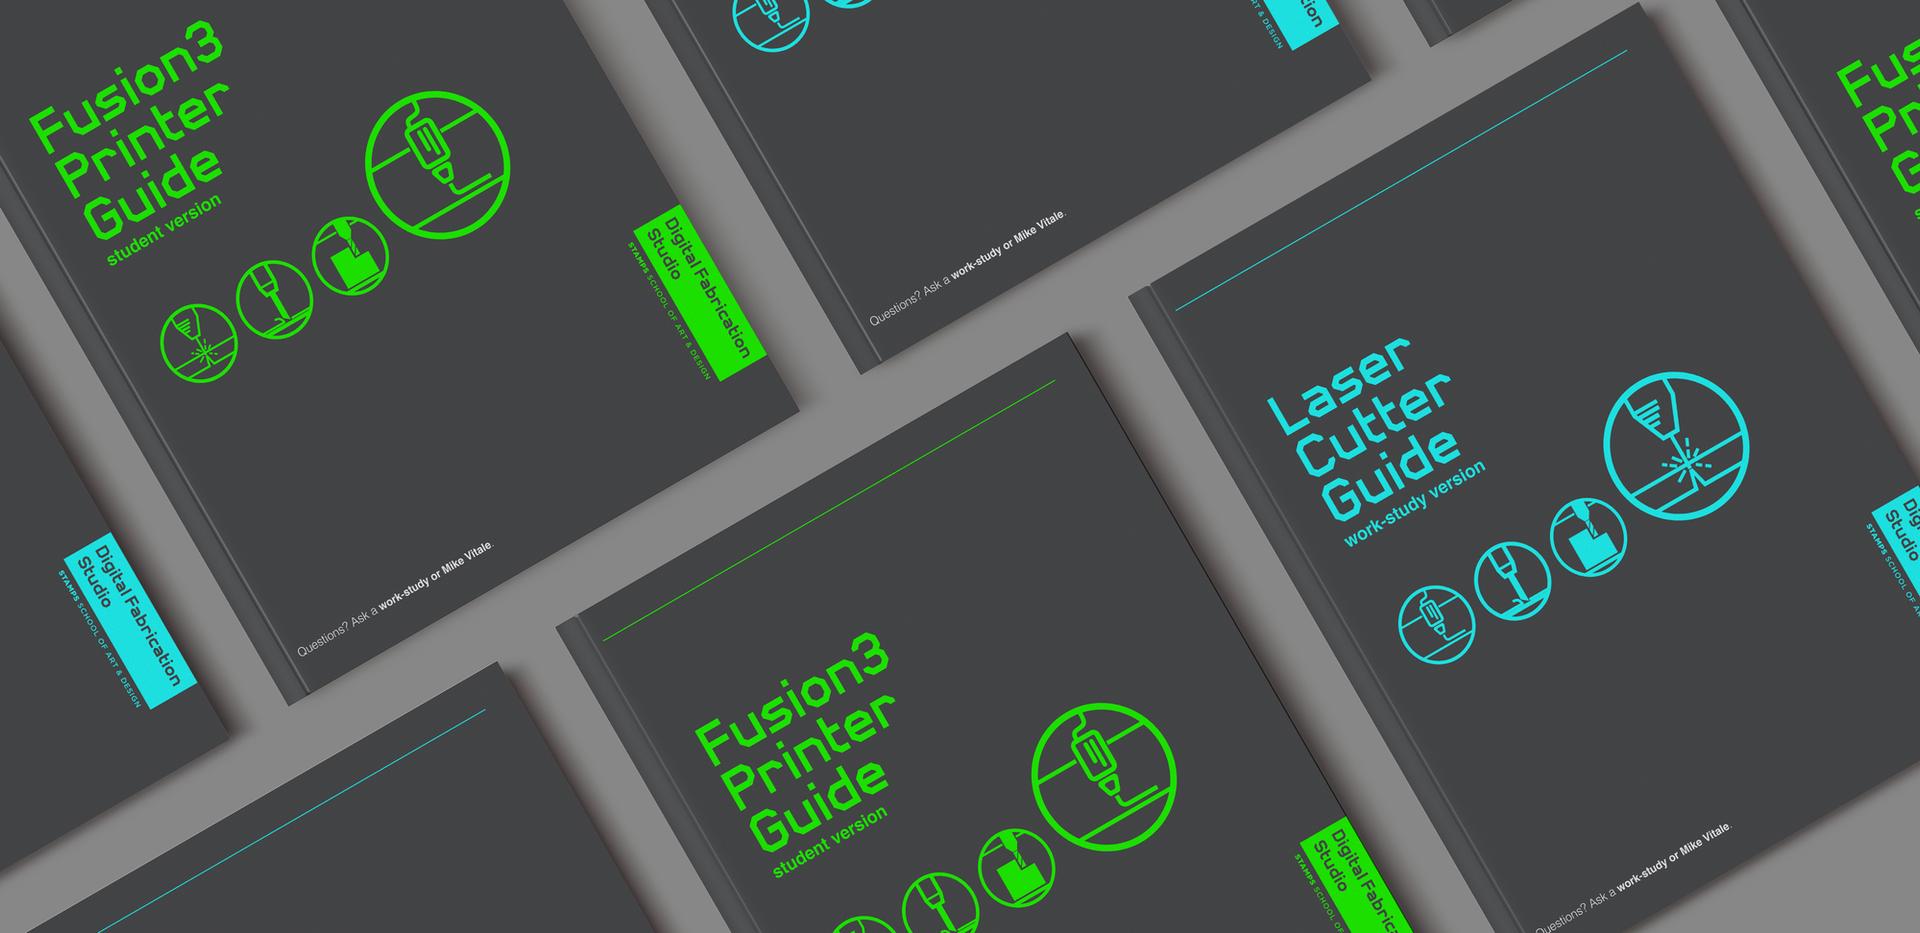 Digital Fabrication Studio Guides